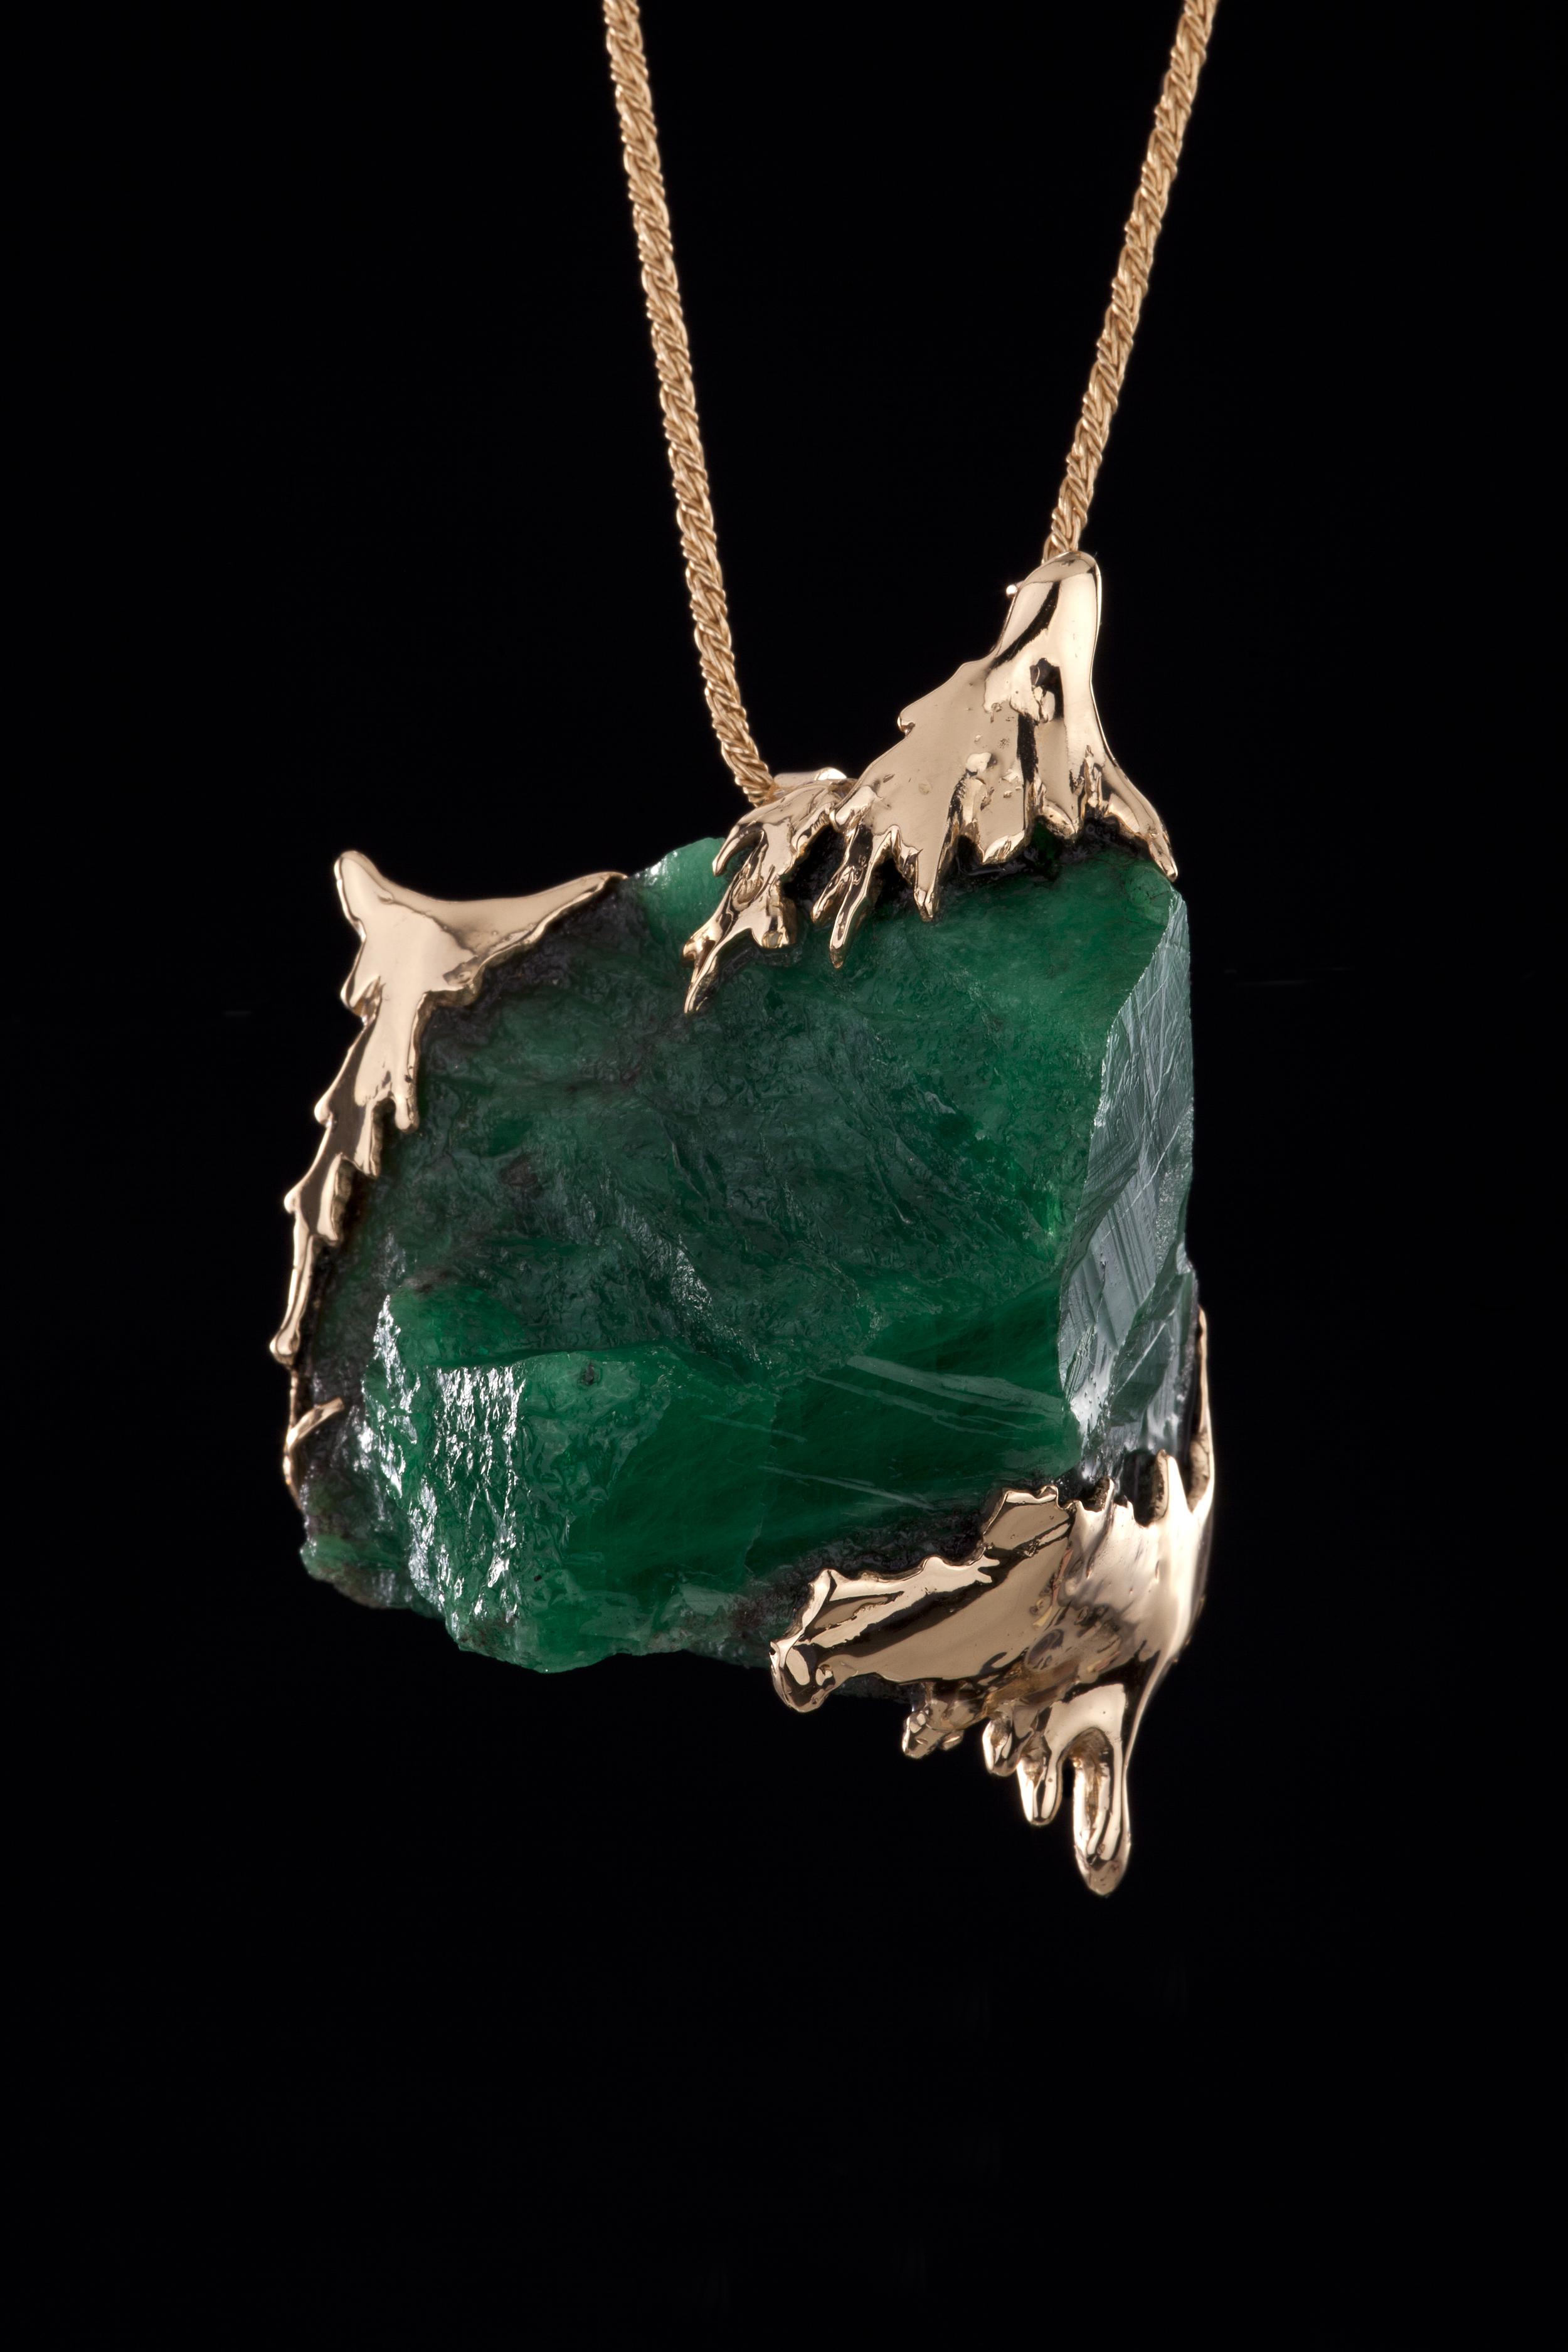 Yunnan emerald necklace